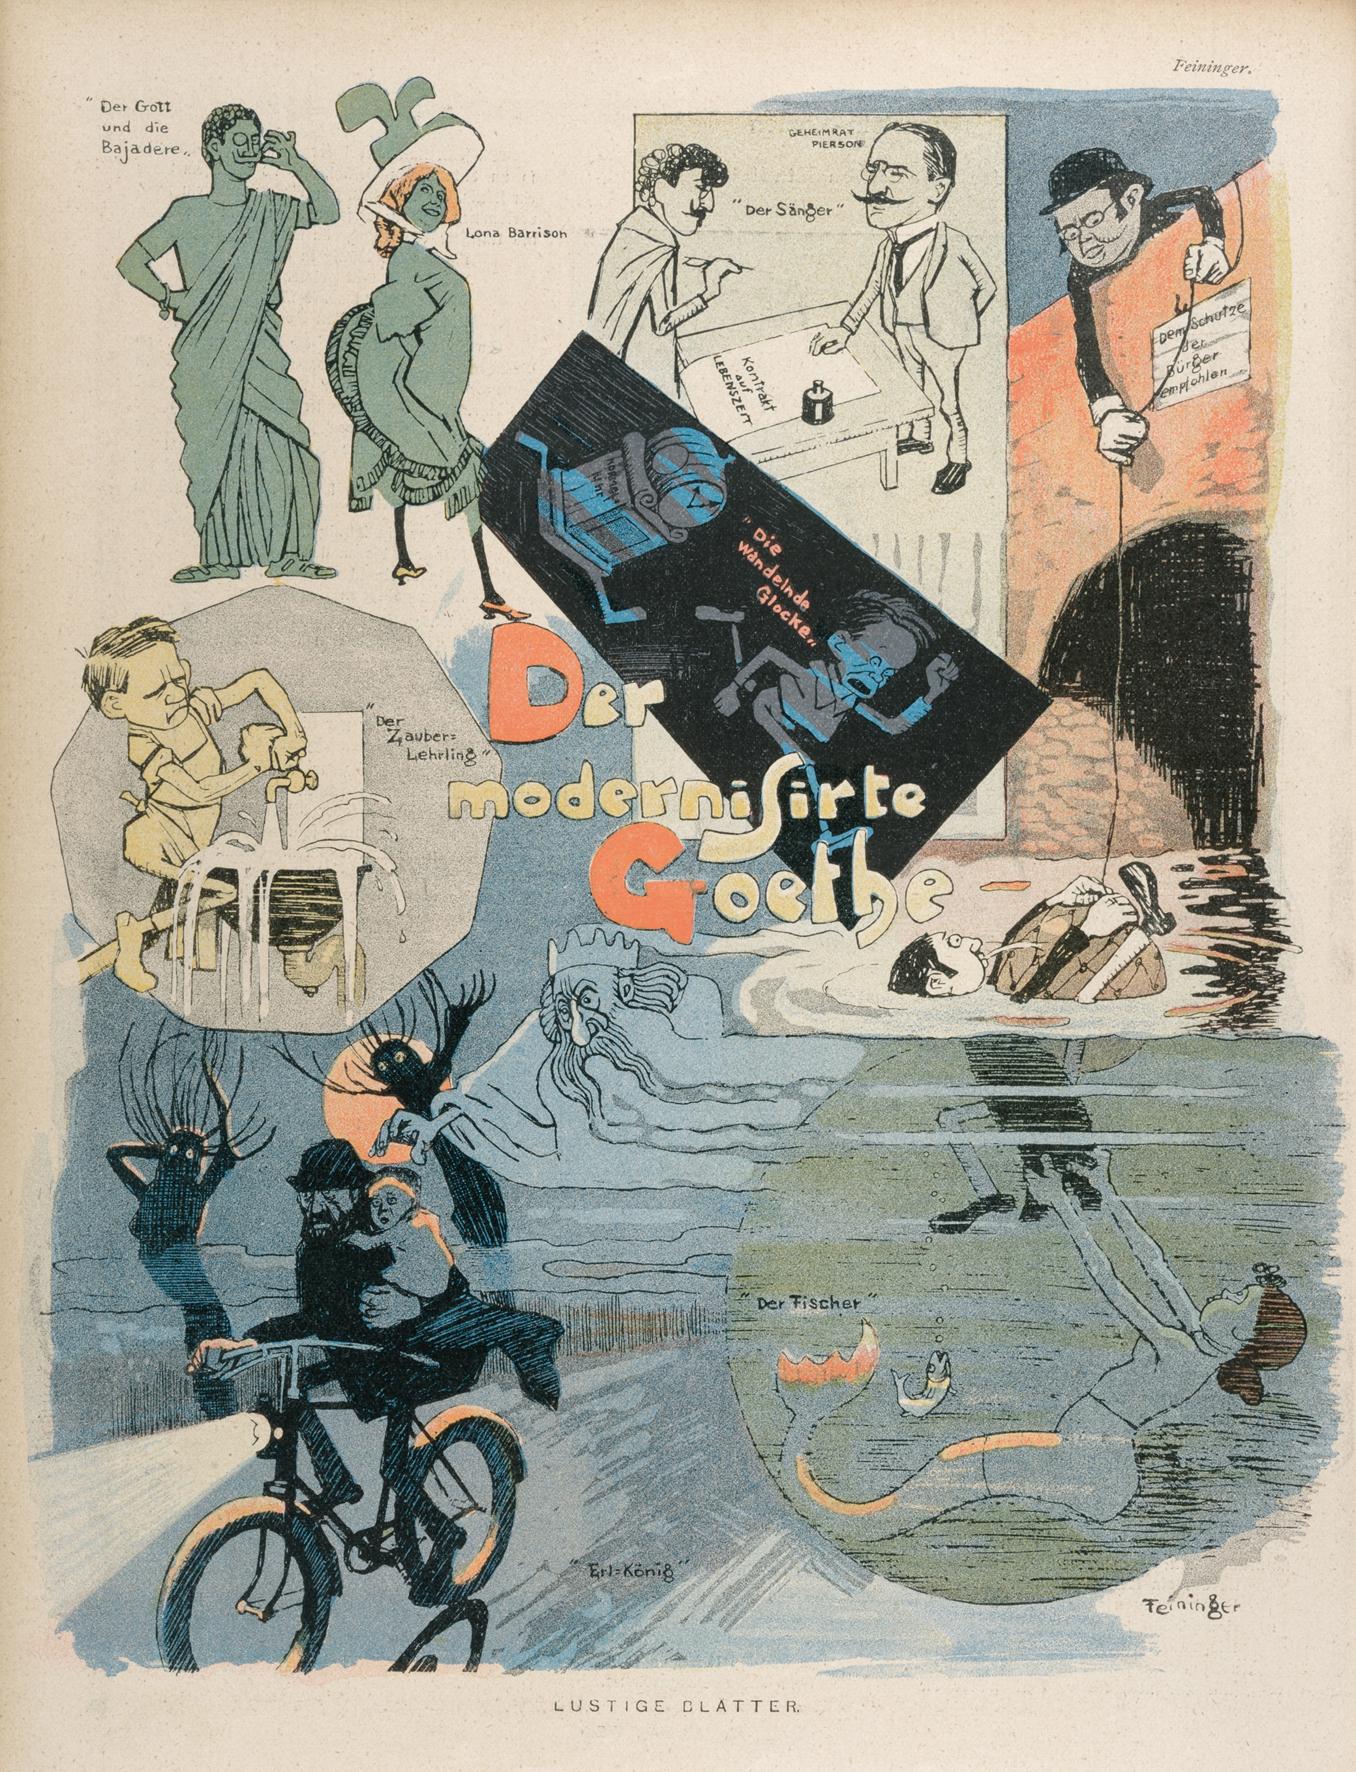 Lyonel Feininger. Der modernisierte Goethe, 1899. Zeitungsdruck, 31 x 24 cm, in: Lustige Blätter, XIV. Jg., 1899, Nr. 35, S. 10, Privatsammlung © VG Bildkunst Bonn